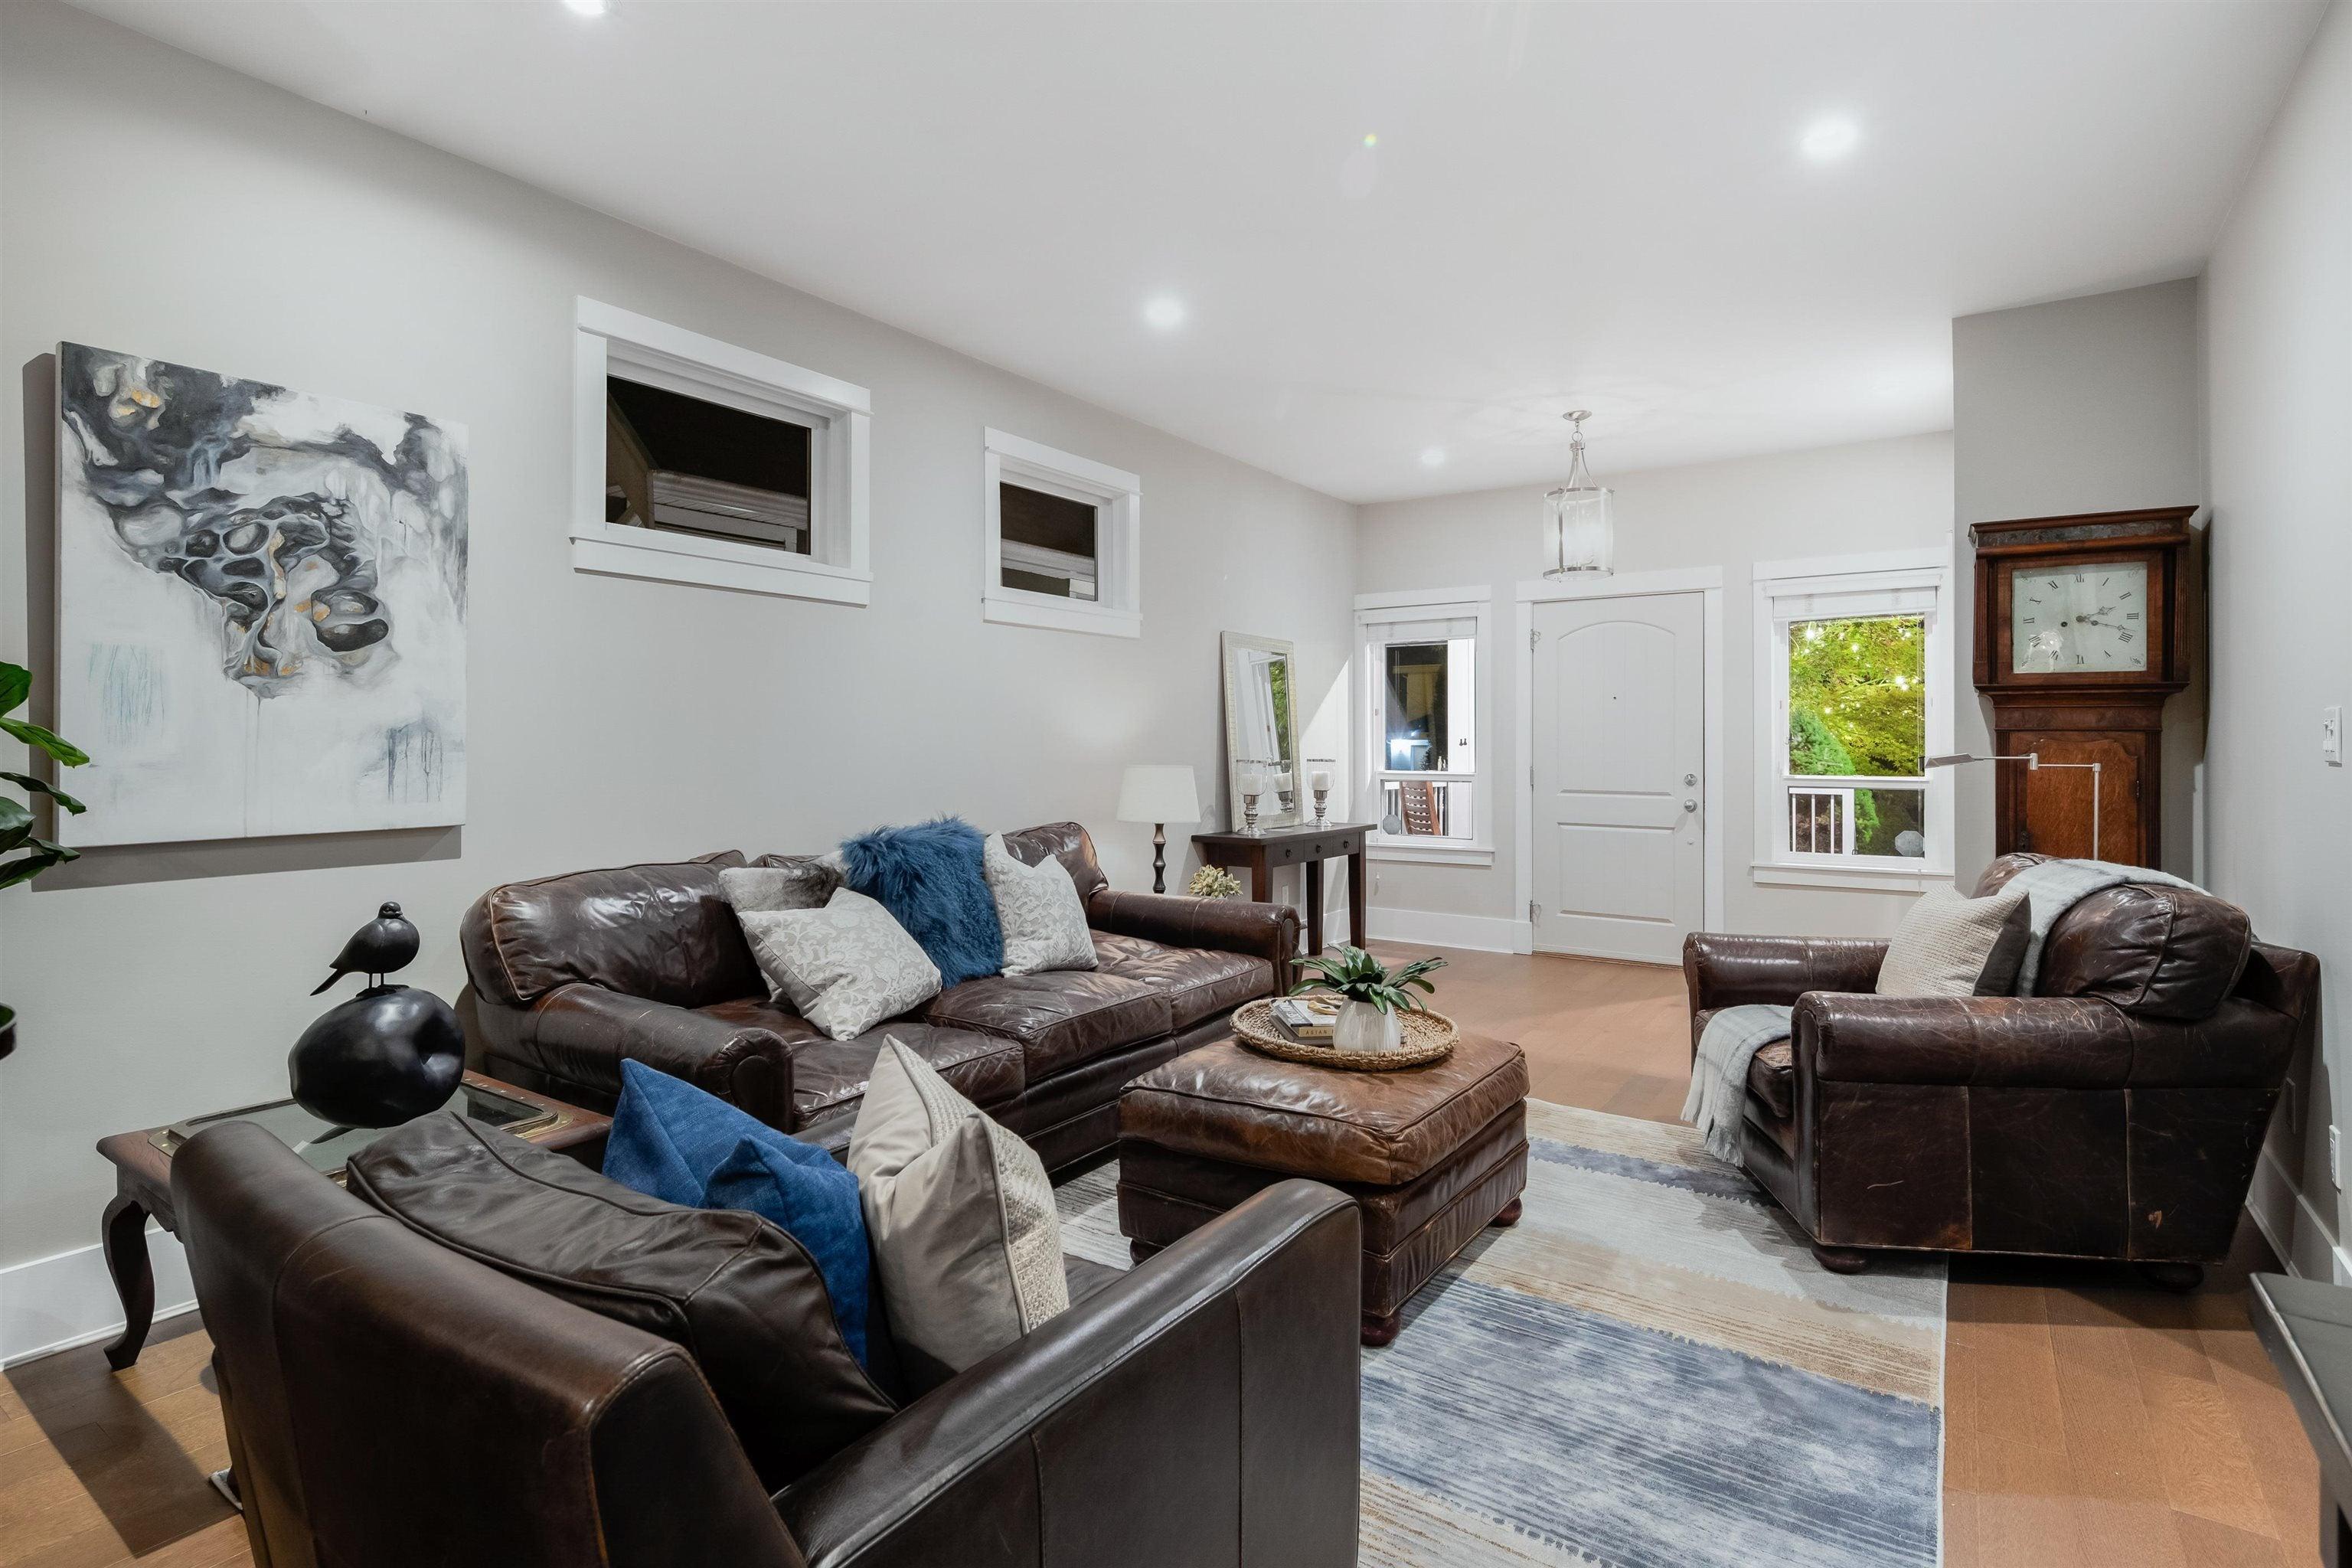 2258 WINDRIDGE DRIVE - Seymour NV House/Single Family for sale, 5 Bedrooms (R2617156) - #13